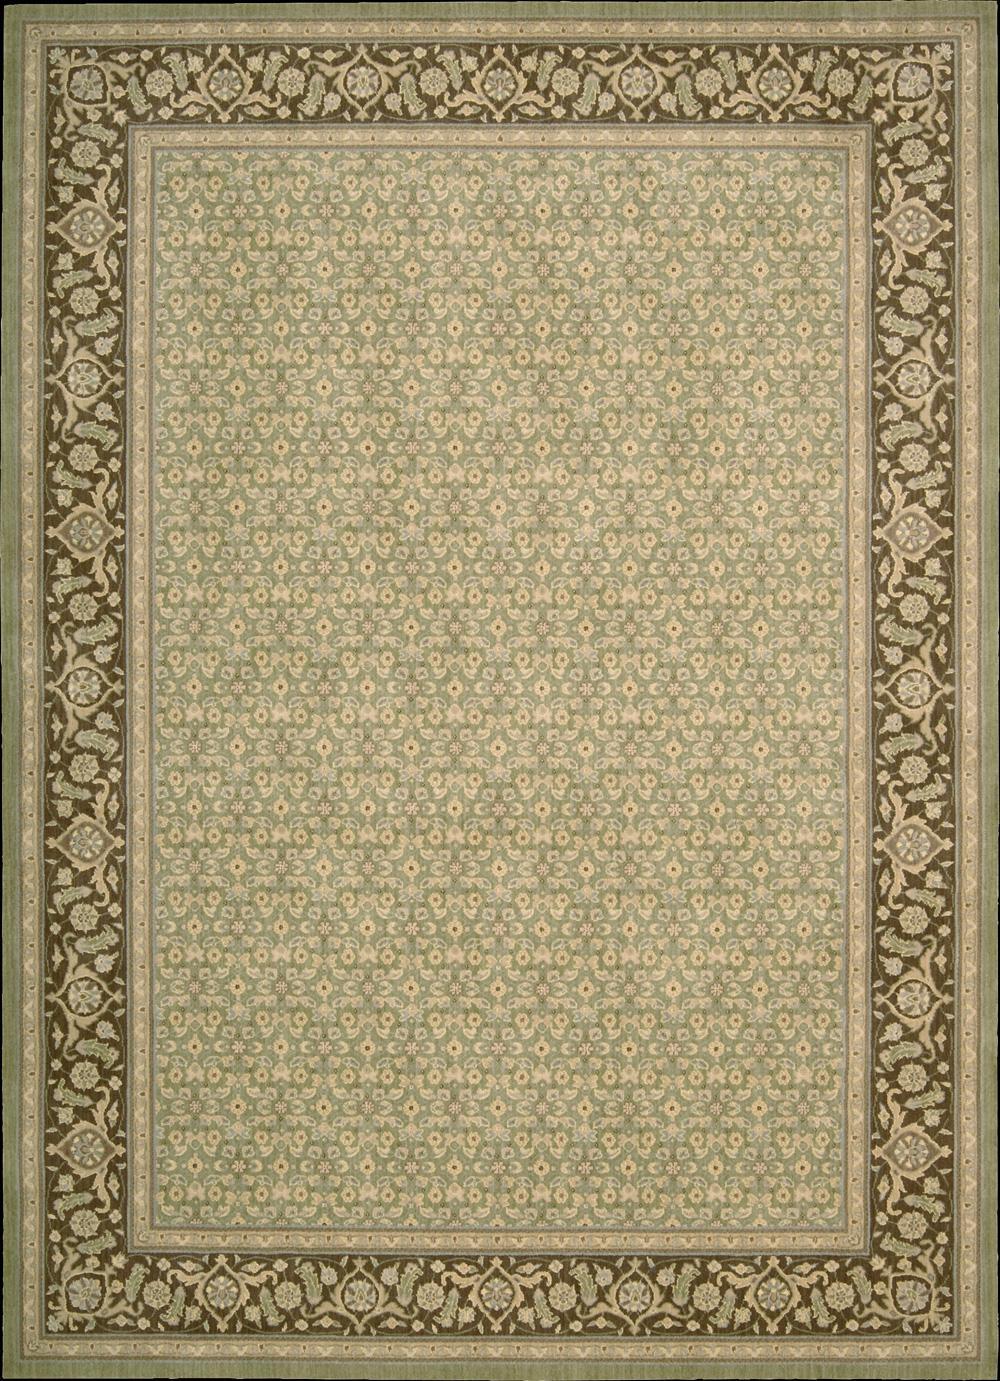 "Nourison Persian Empire Area Rug 3'6"" x 5'6"" - Item Number: 44211"